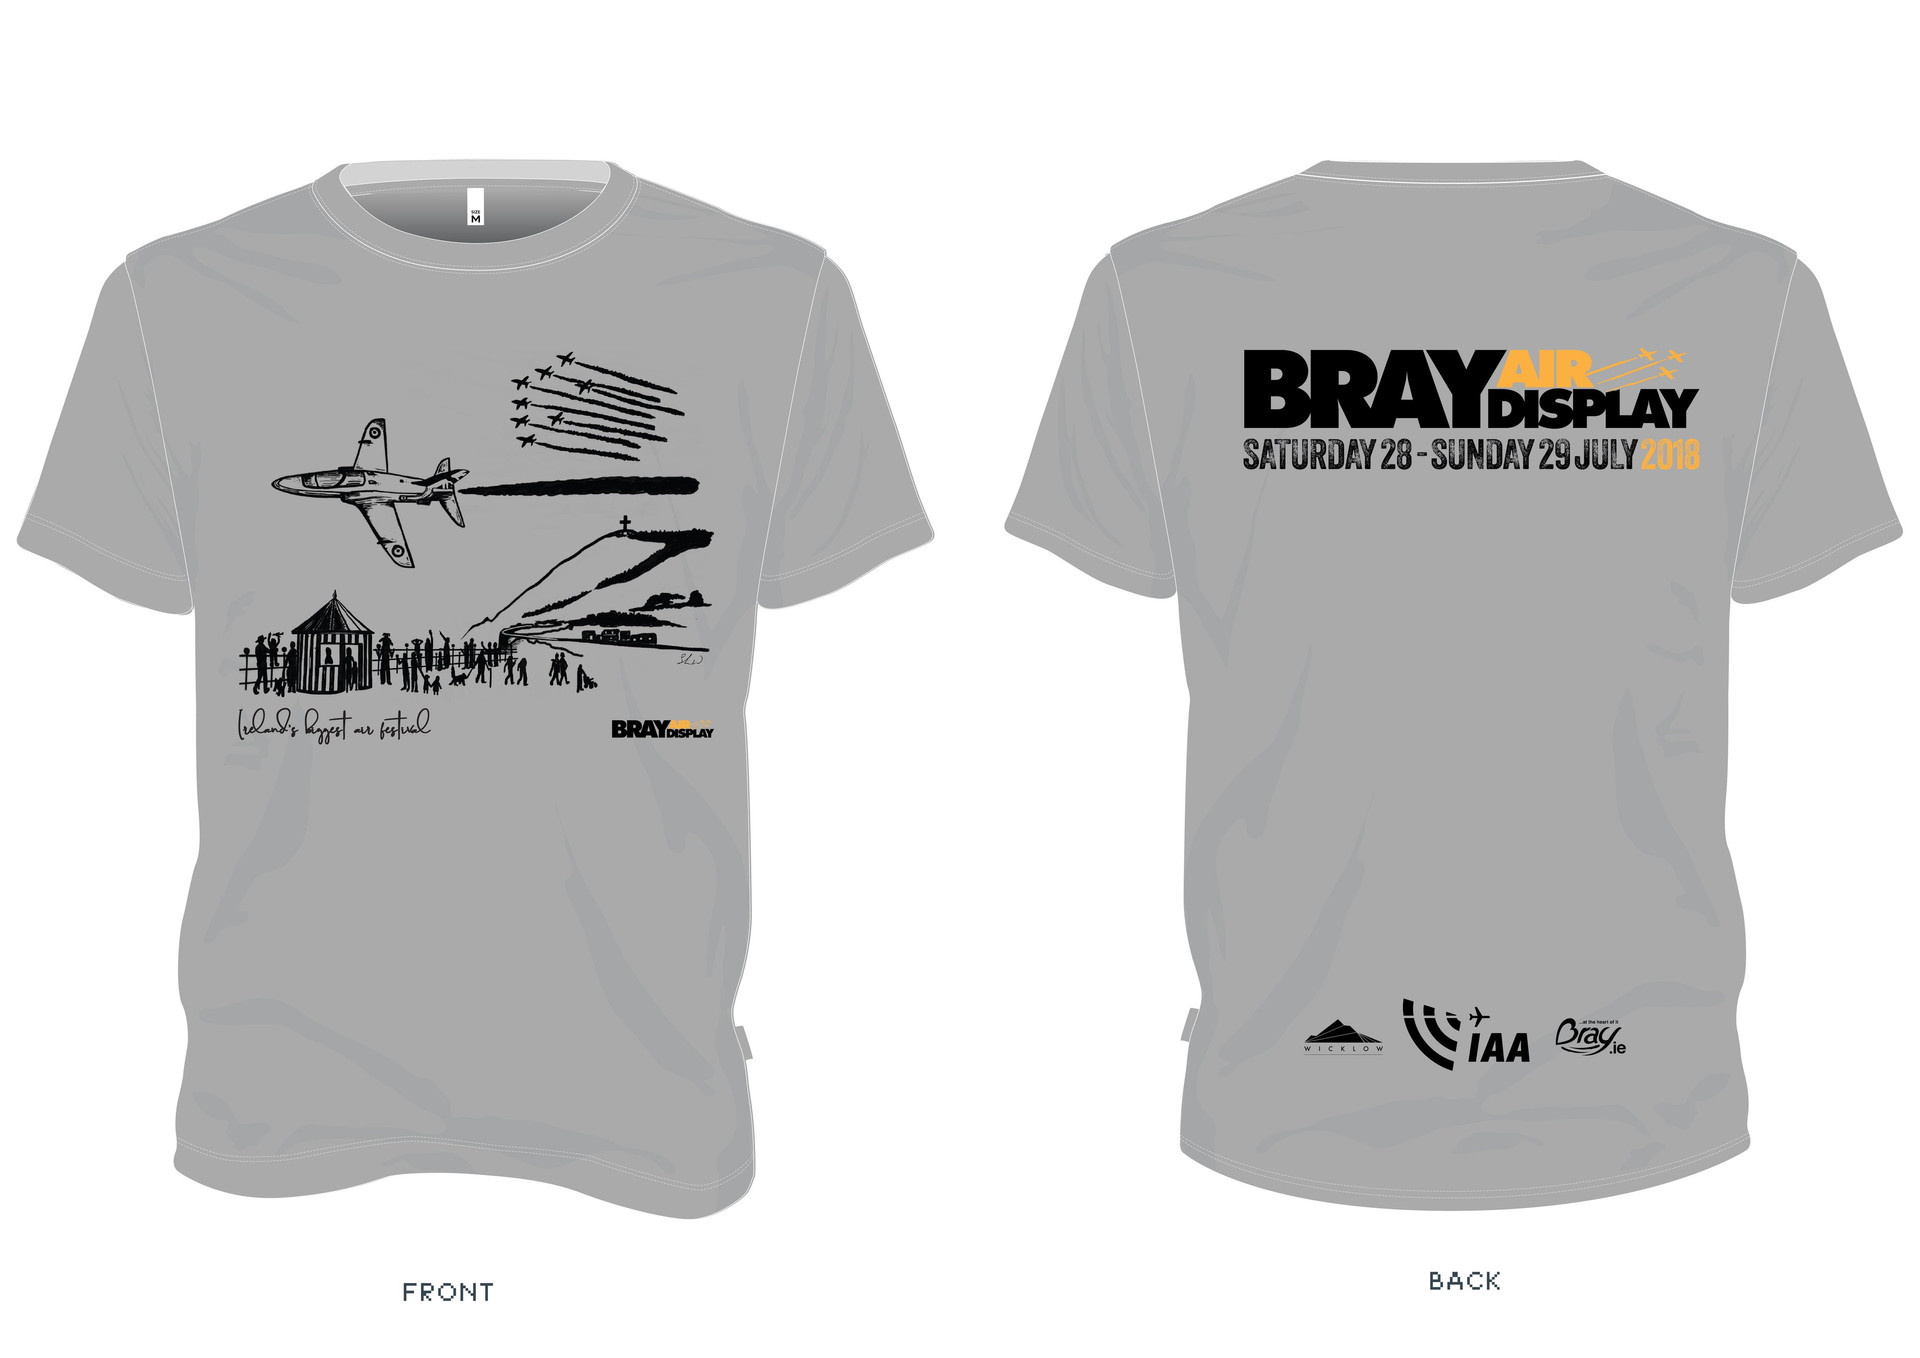 Bray Summer Festival